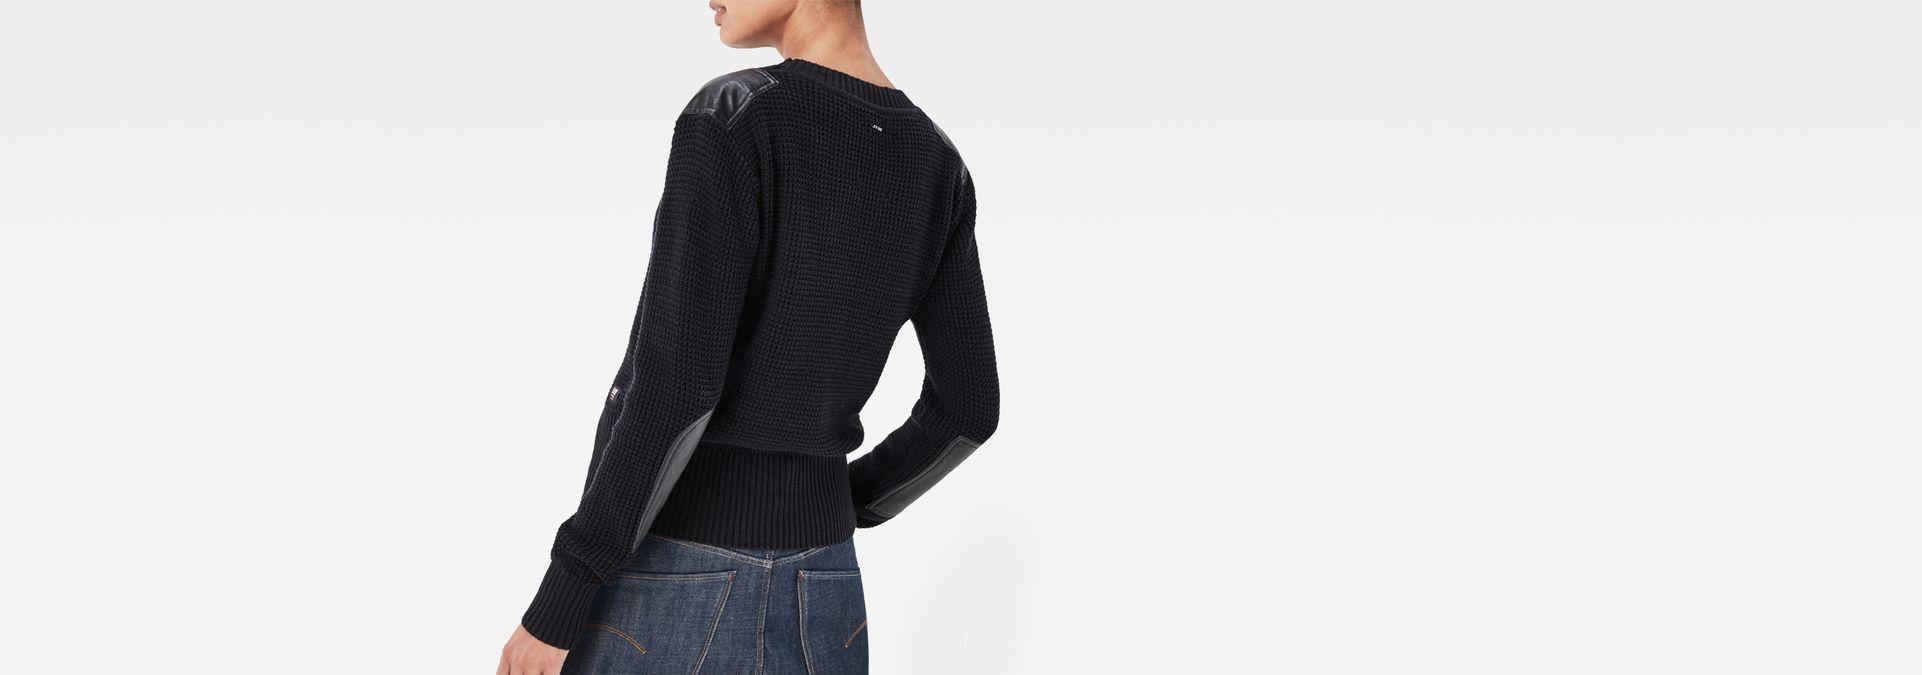 zajie knit black mazarine blue women sale g star raw. Black Bedroom Furniture Sets. Home Design Ideas